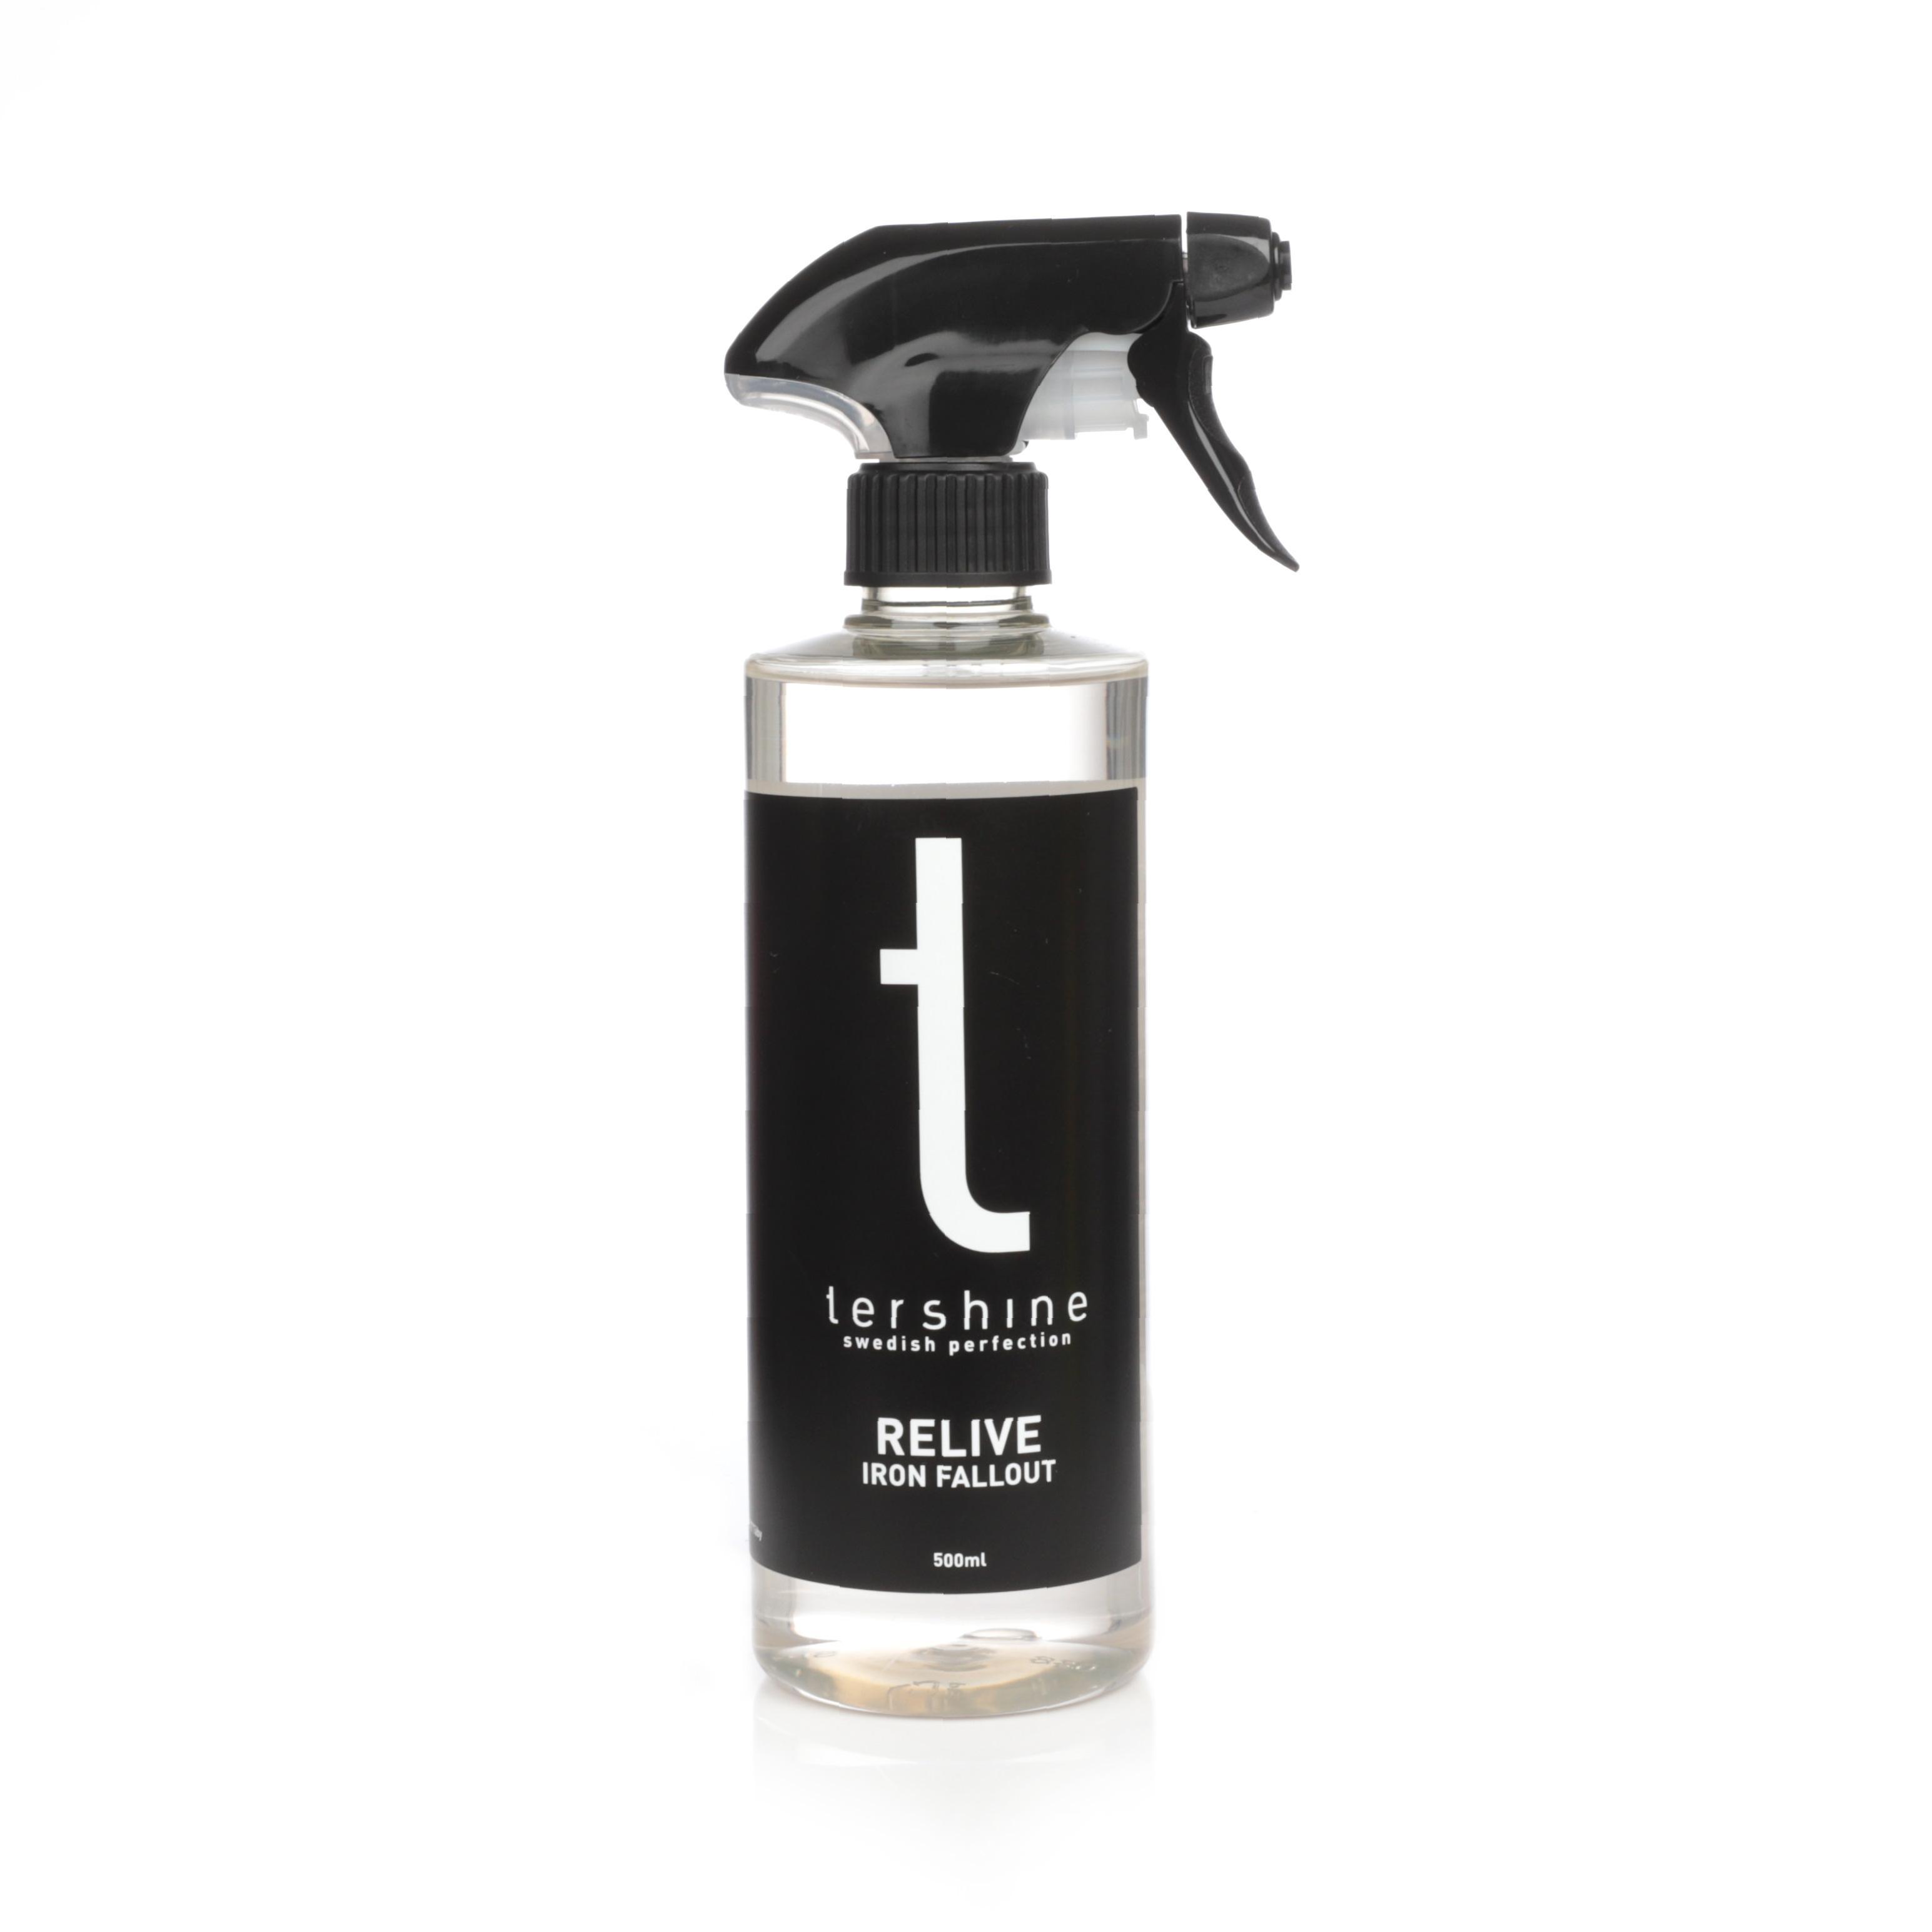 Flygrostlösare tershine Relive, Flaska 500 ml + Fälgborste